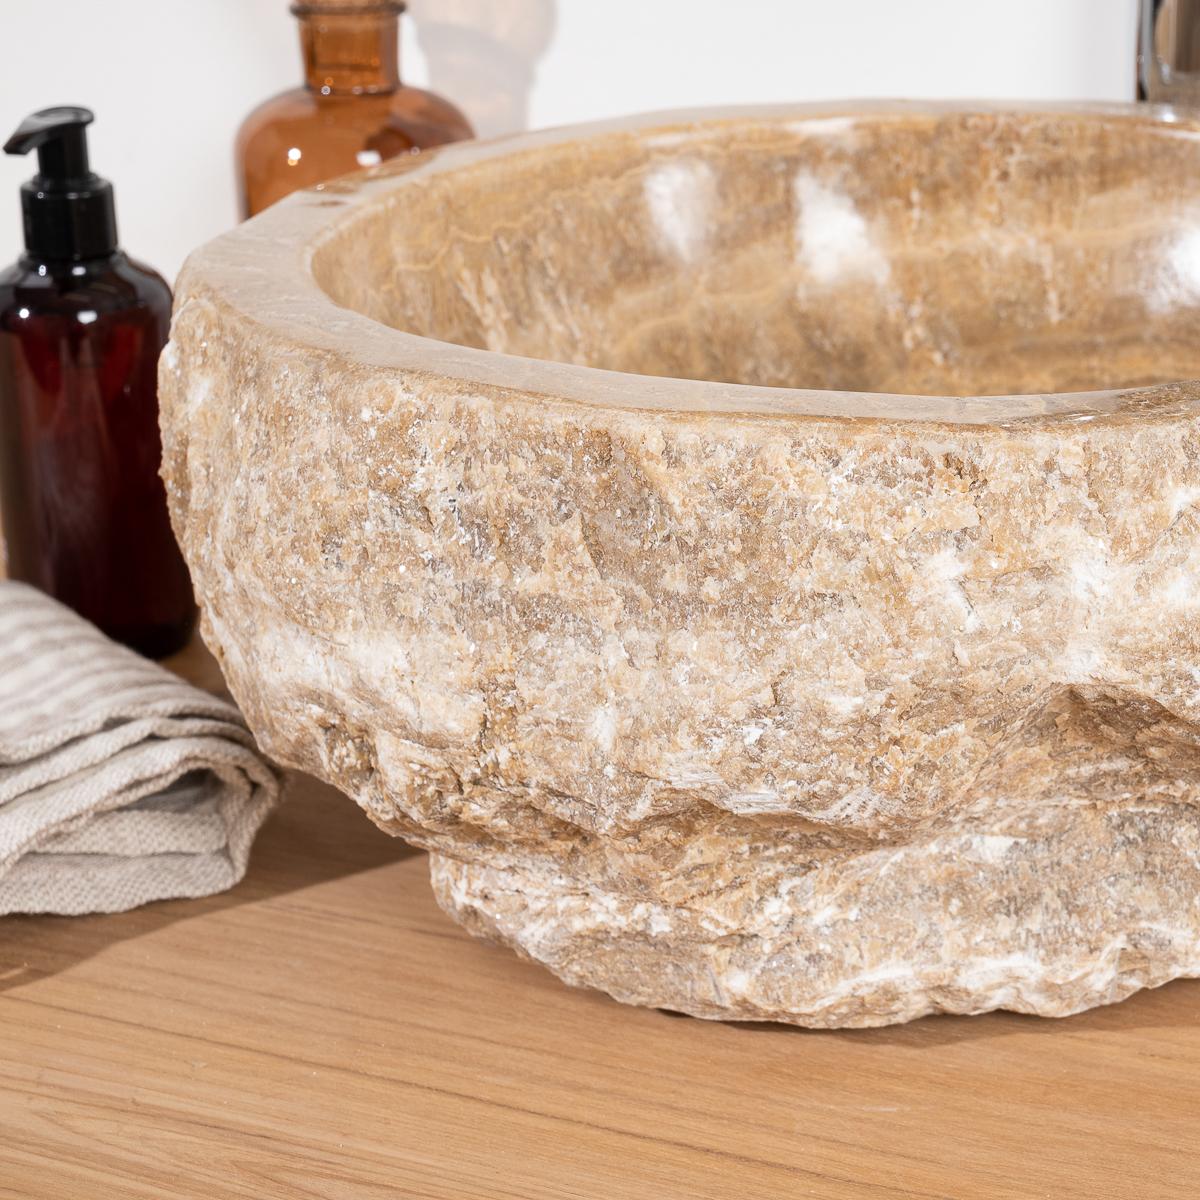 vasque poser en pierre d 39 onyx l 30 35 cm. Black Bedroom Furniture Sets. Home Design Ideas